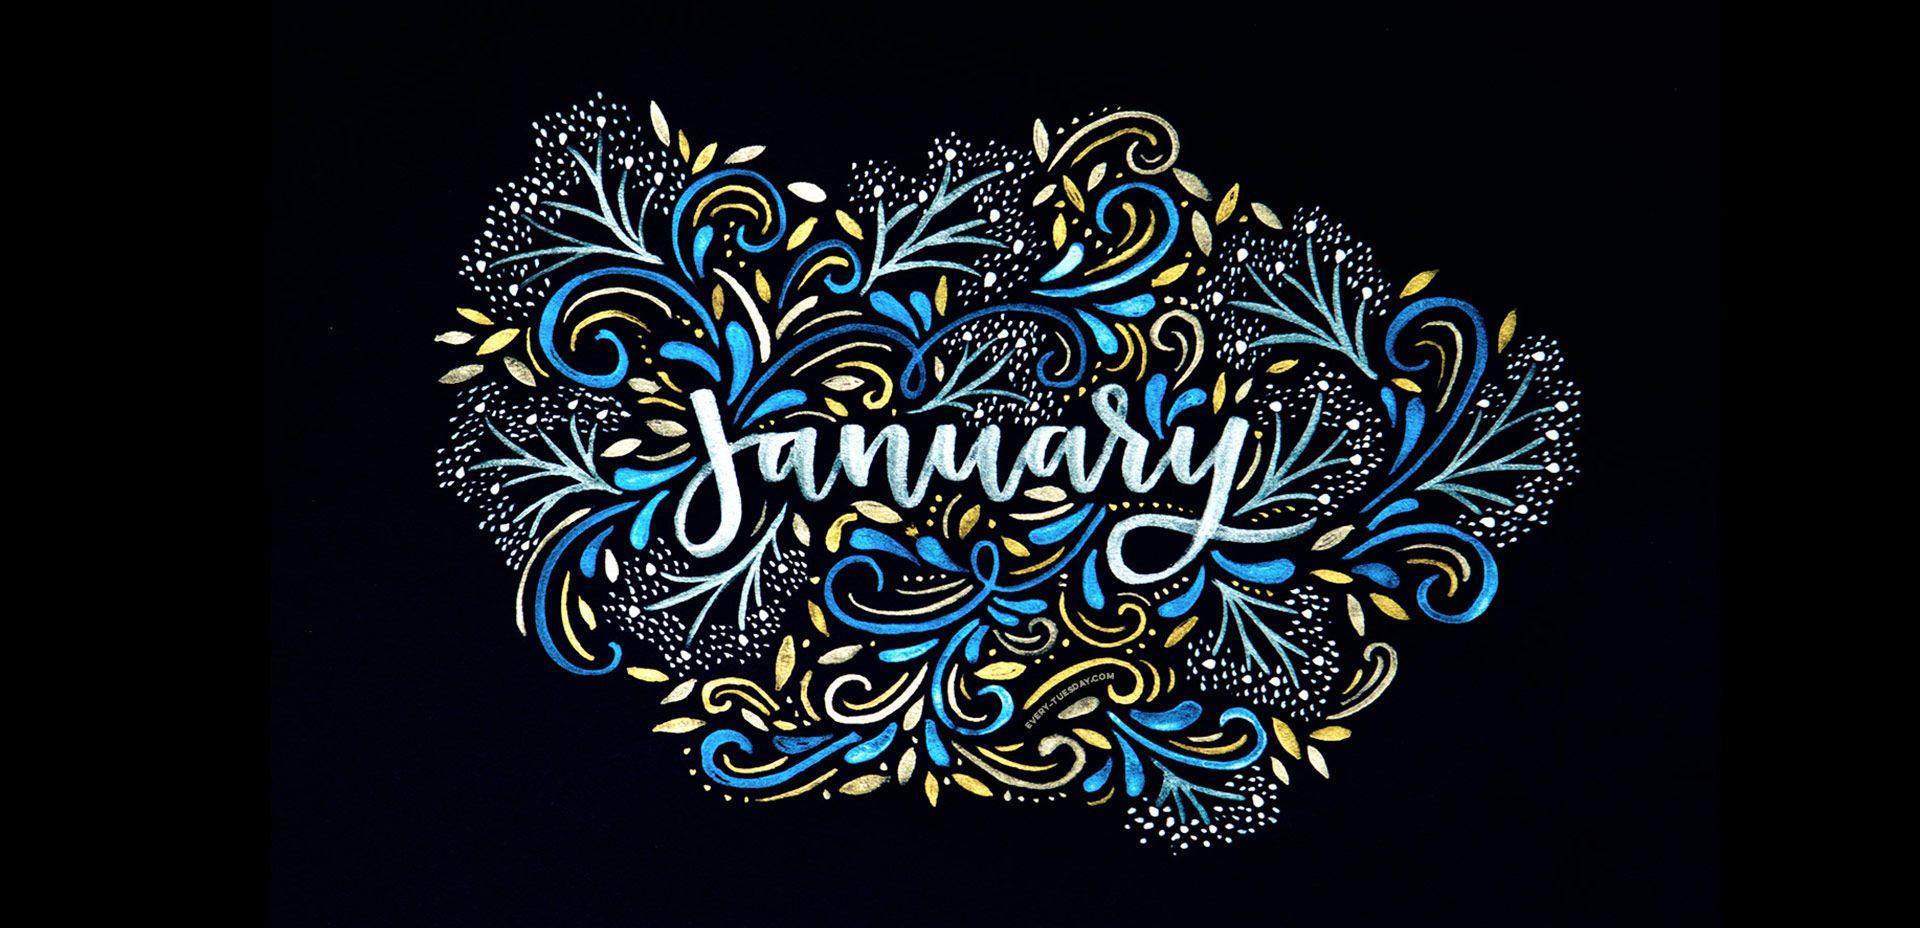 Freebie January 2017 Desktop Wallpapers January